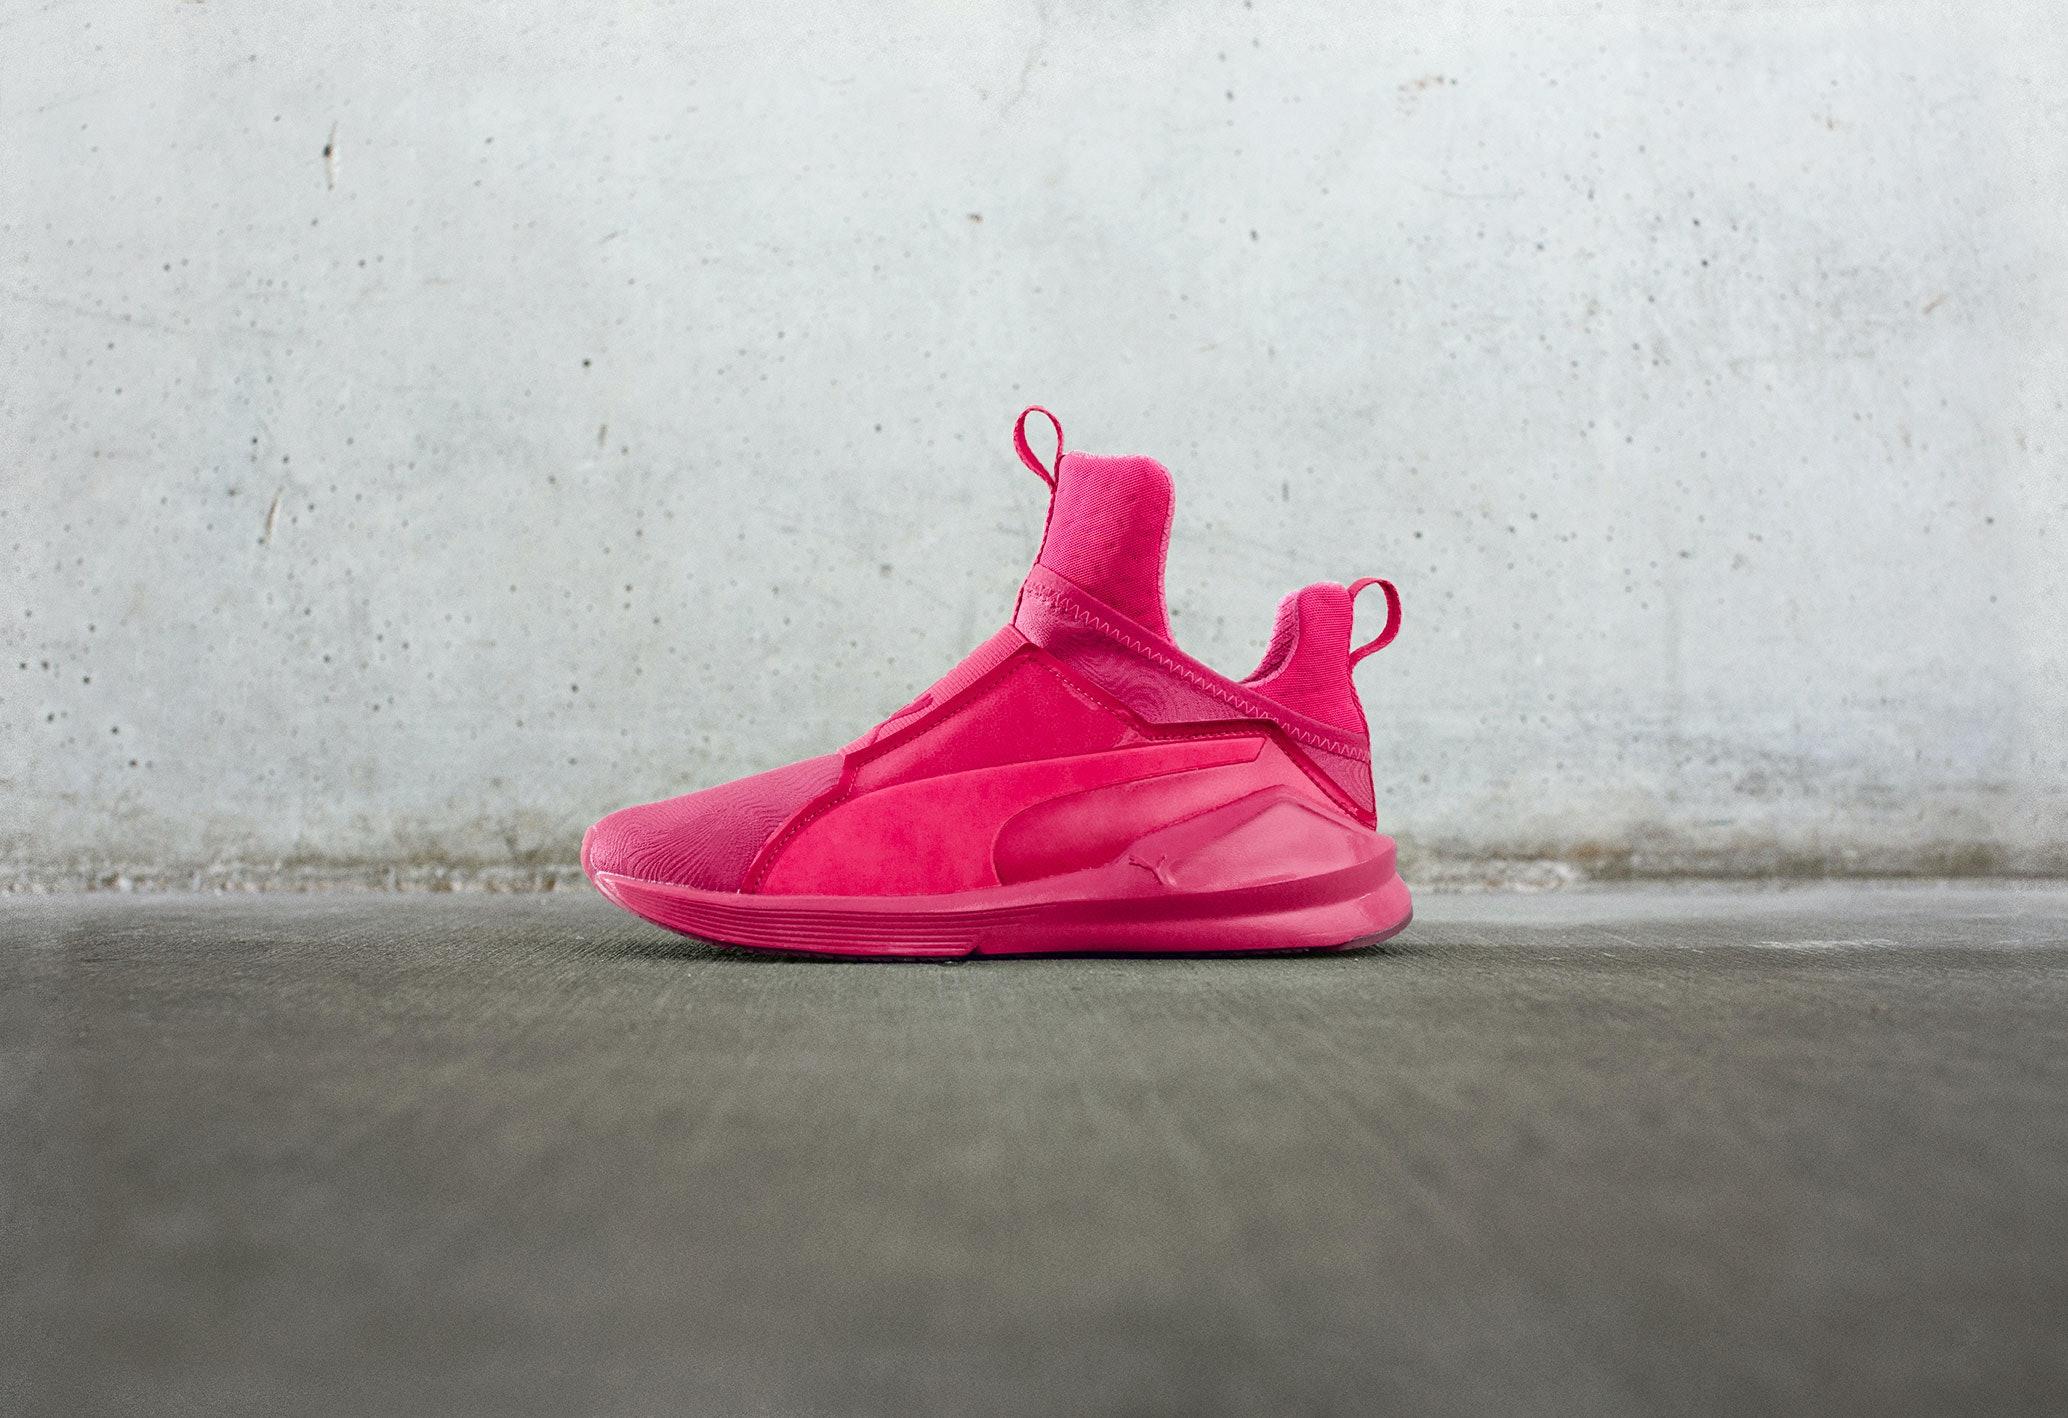 bright pink pumas - 63% OFF